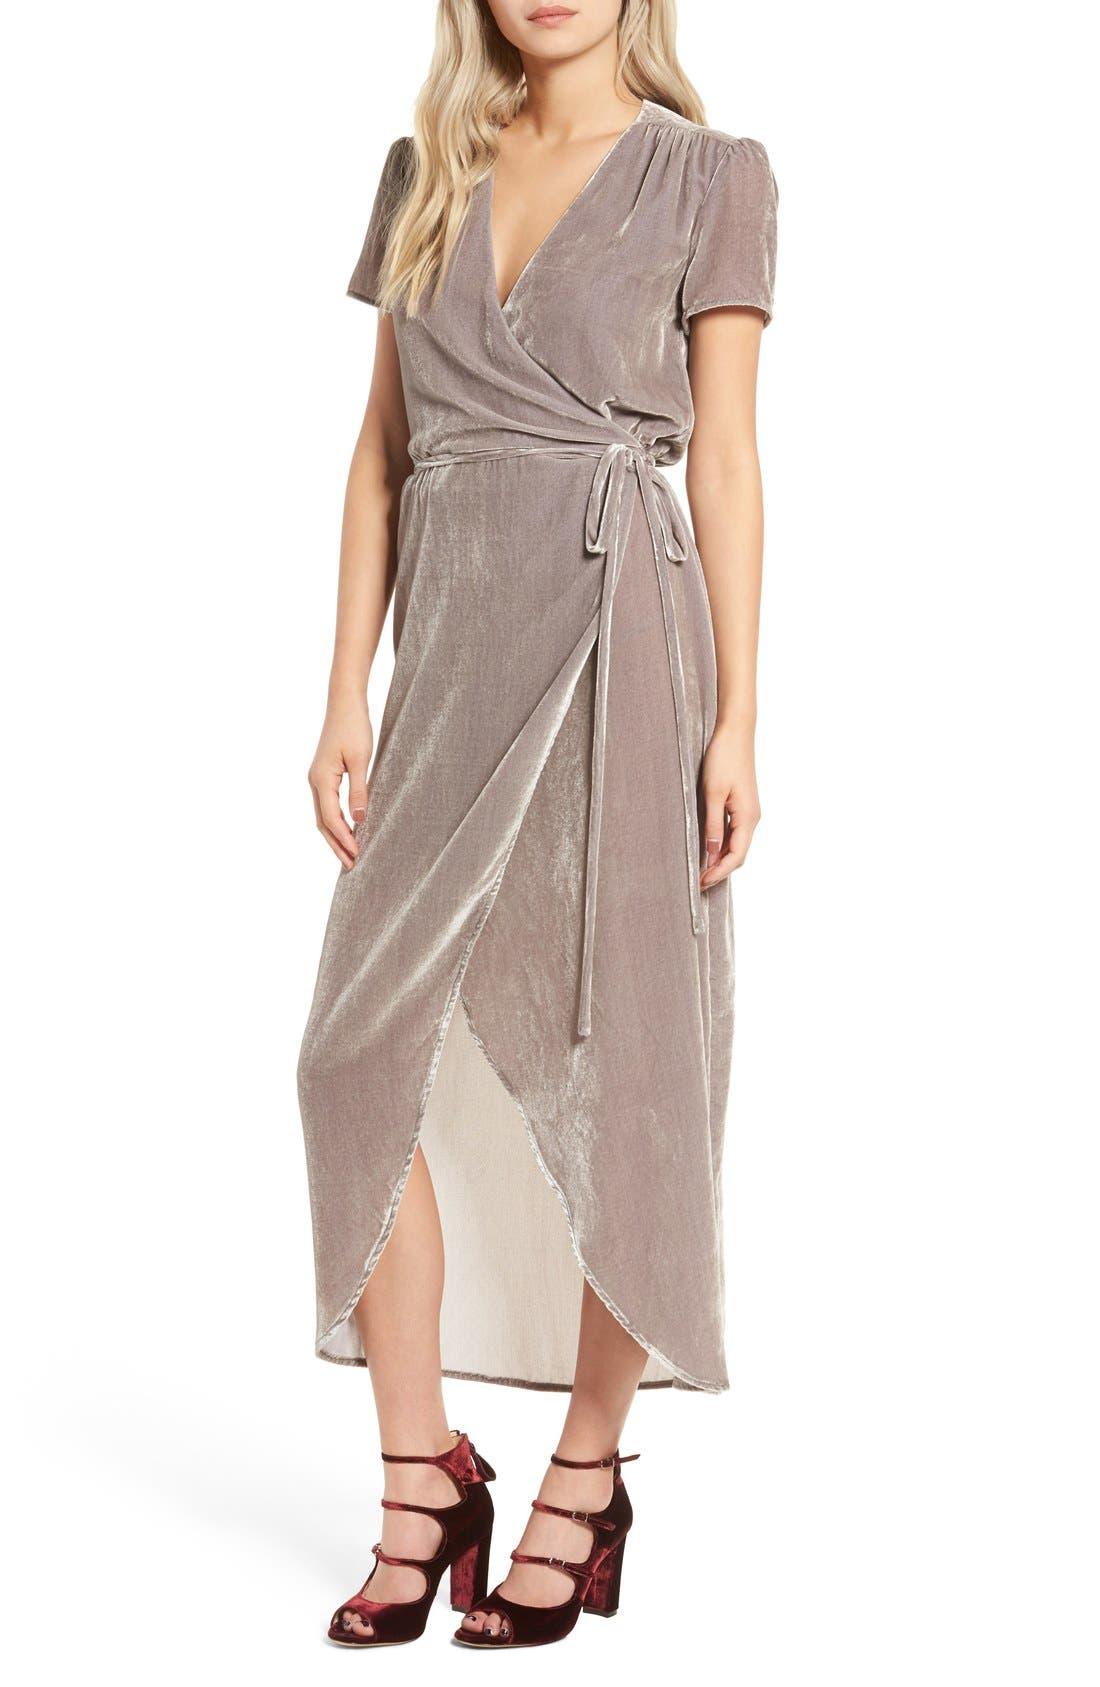 Alternate Image 1 Selected - WAYF Next to You Velvet Wrap Dress